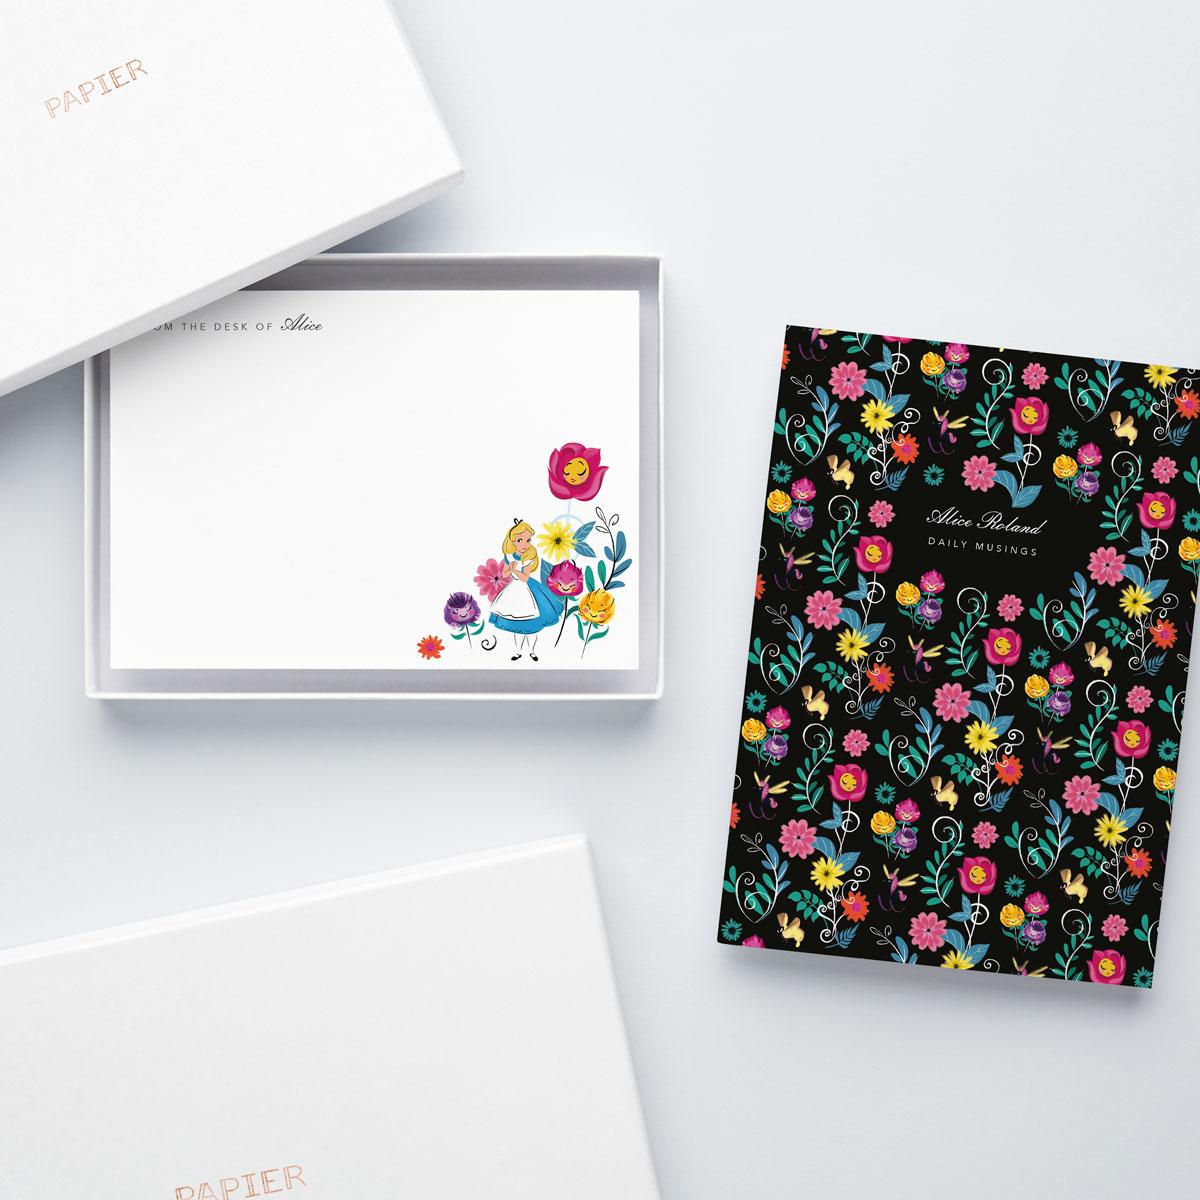 09.18 productimagery bundles booknotecard alice